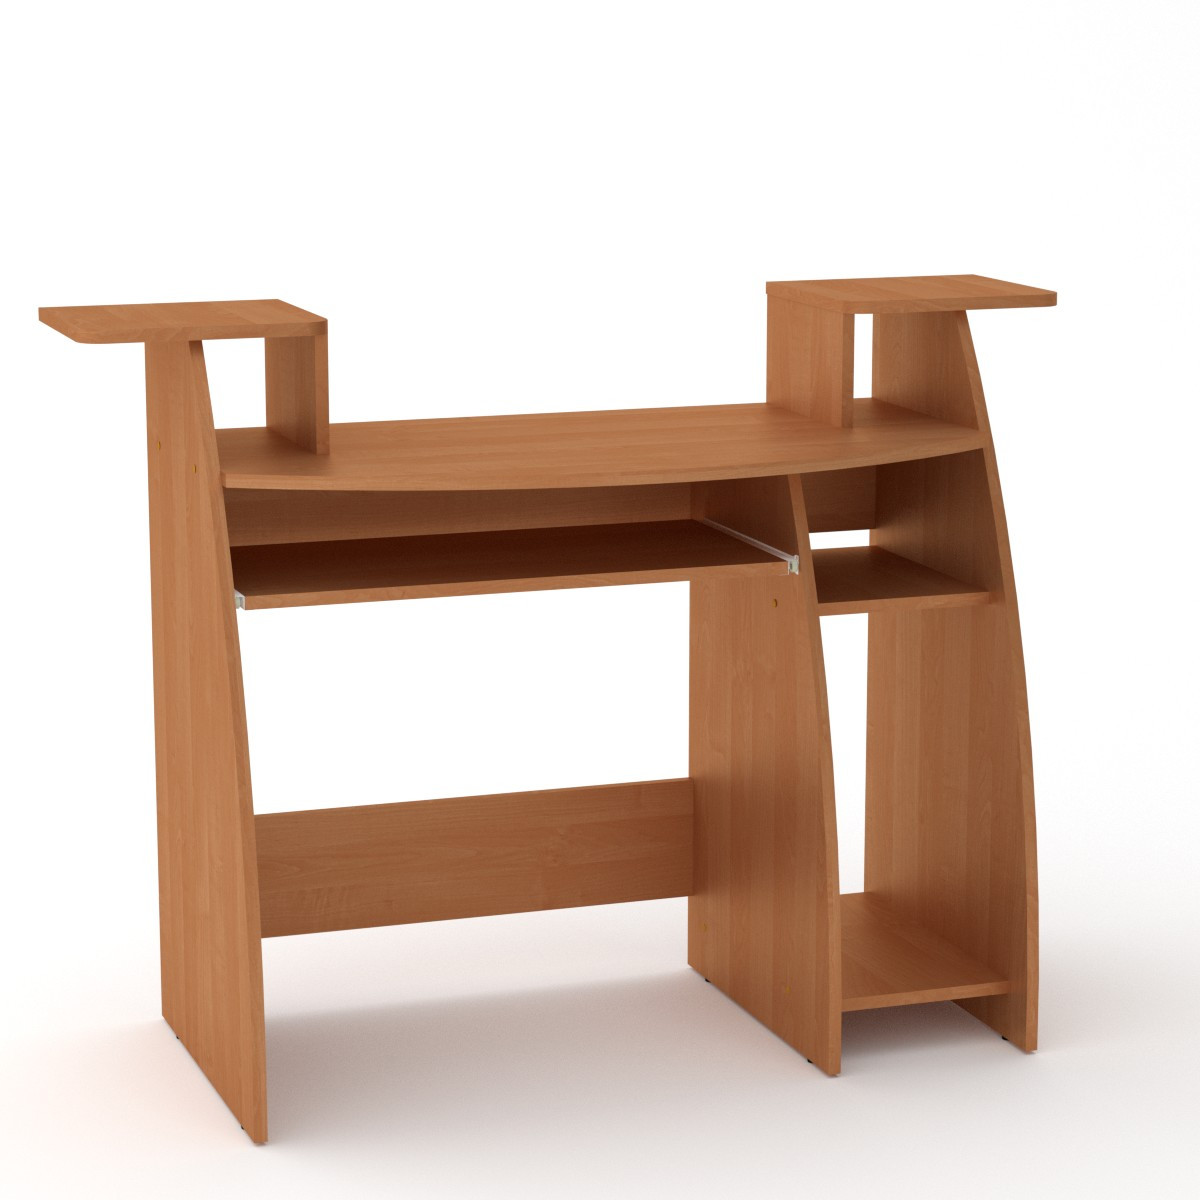 Стол компьютерный СКМ-4 ольха Компанит (123х50х92 см)